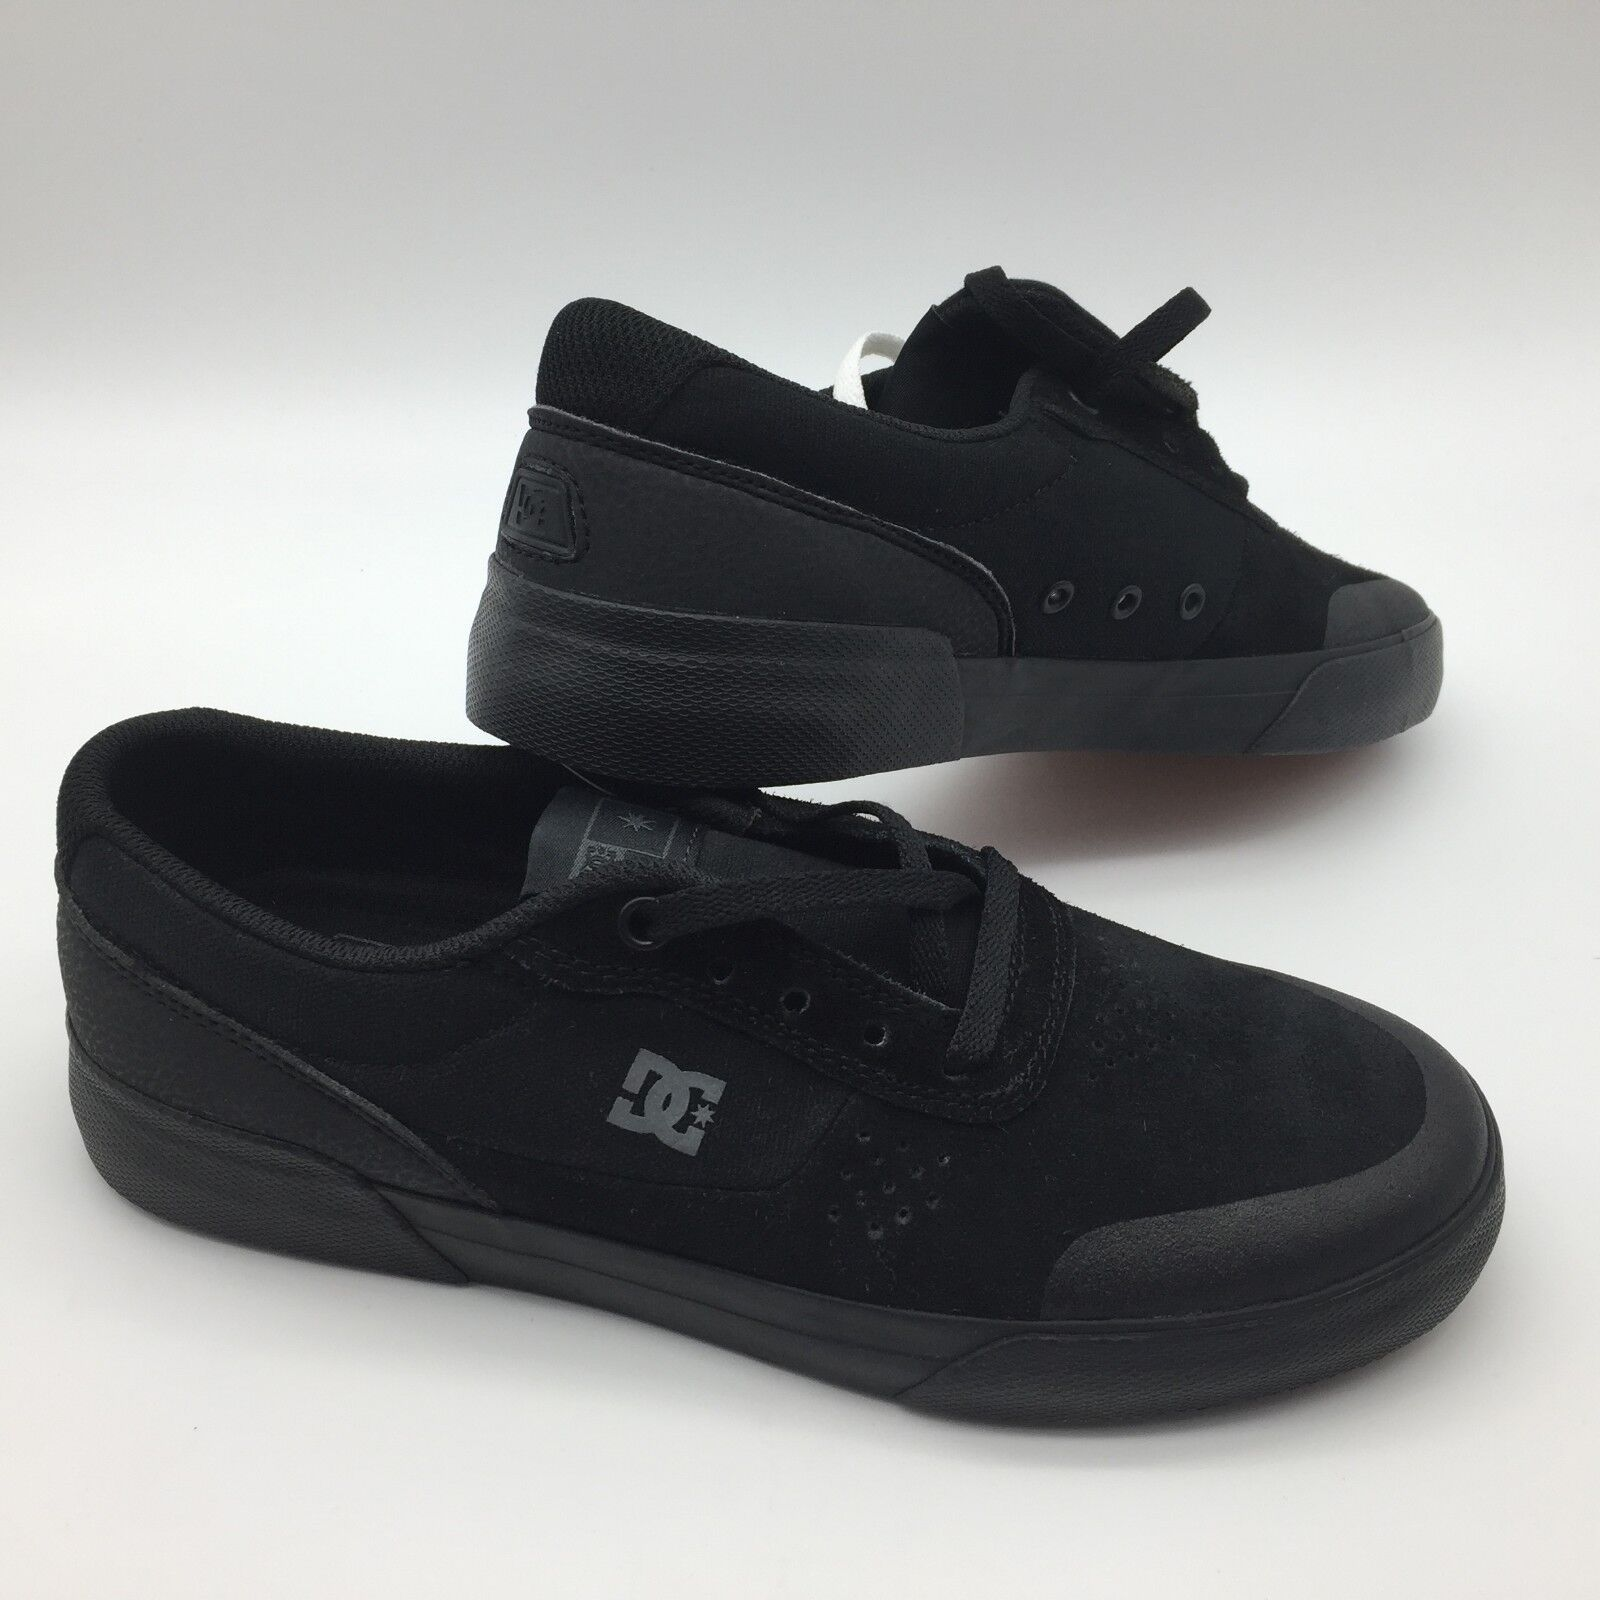 DC Men's shoes  SWITCH PLUS S  Black Black Black(3BK)